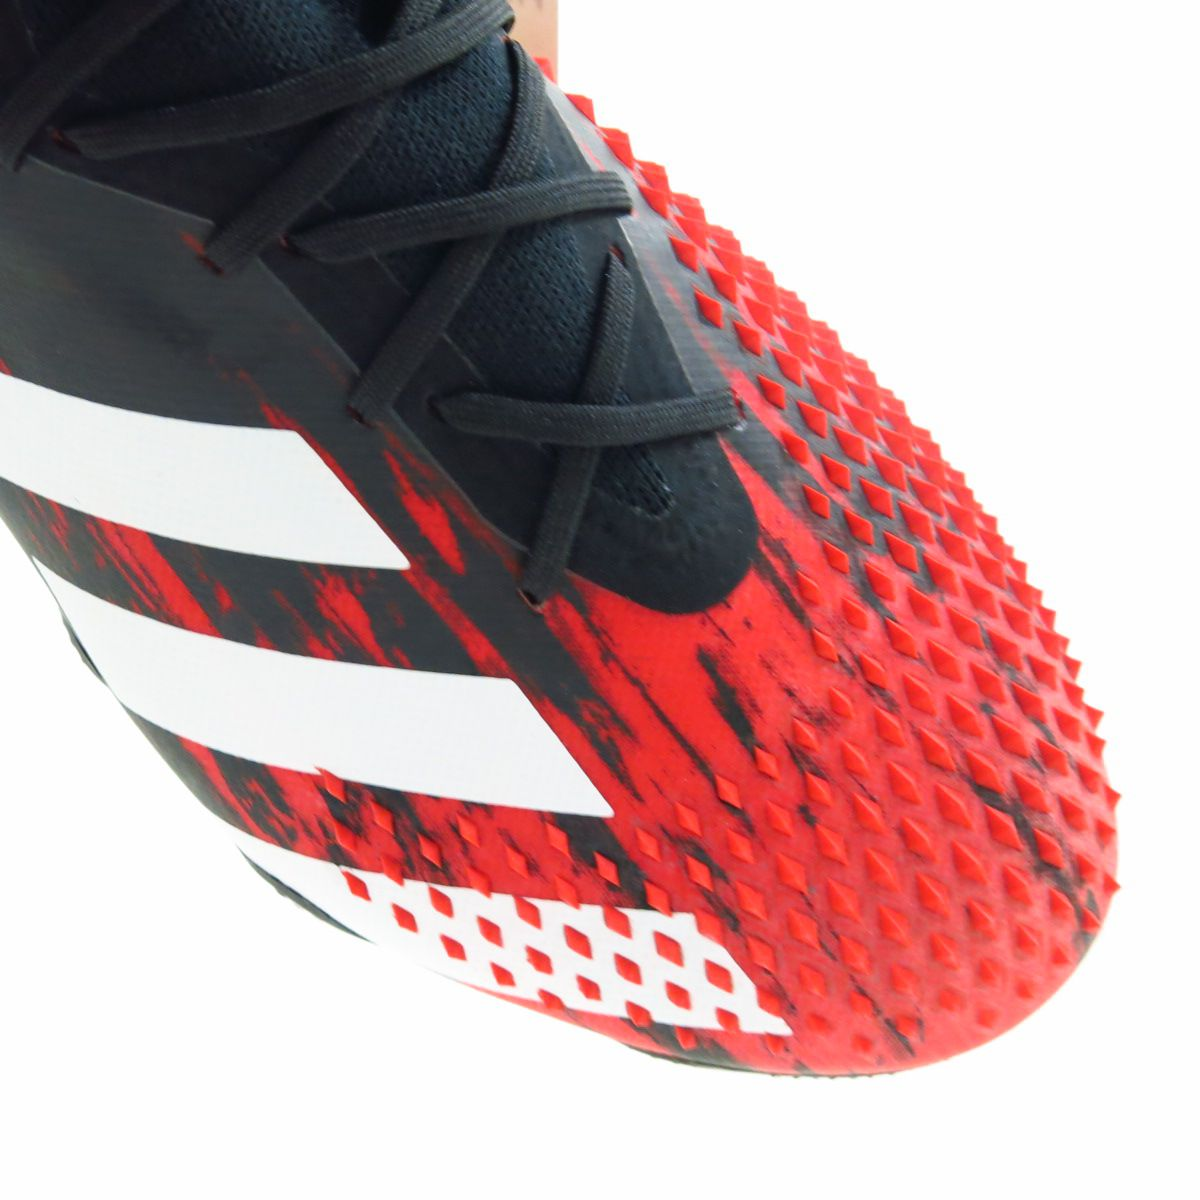 Chuteira Adidas Predator 20.1 SG - Trava Mista